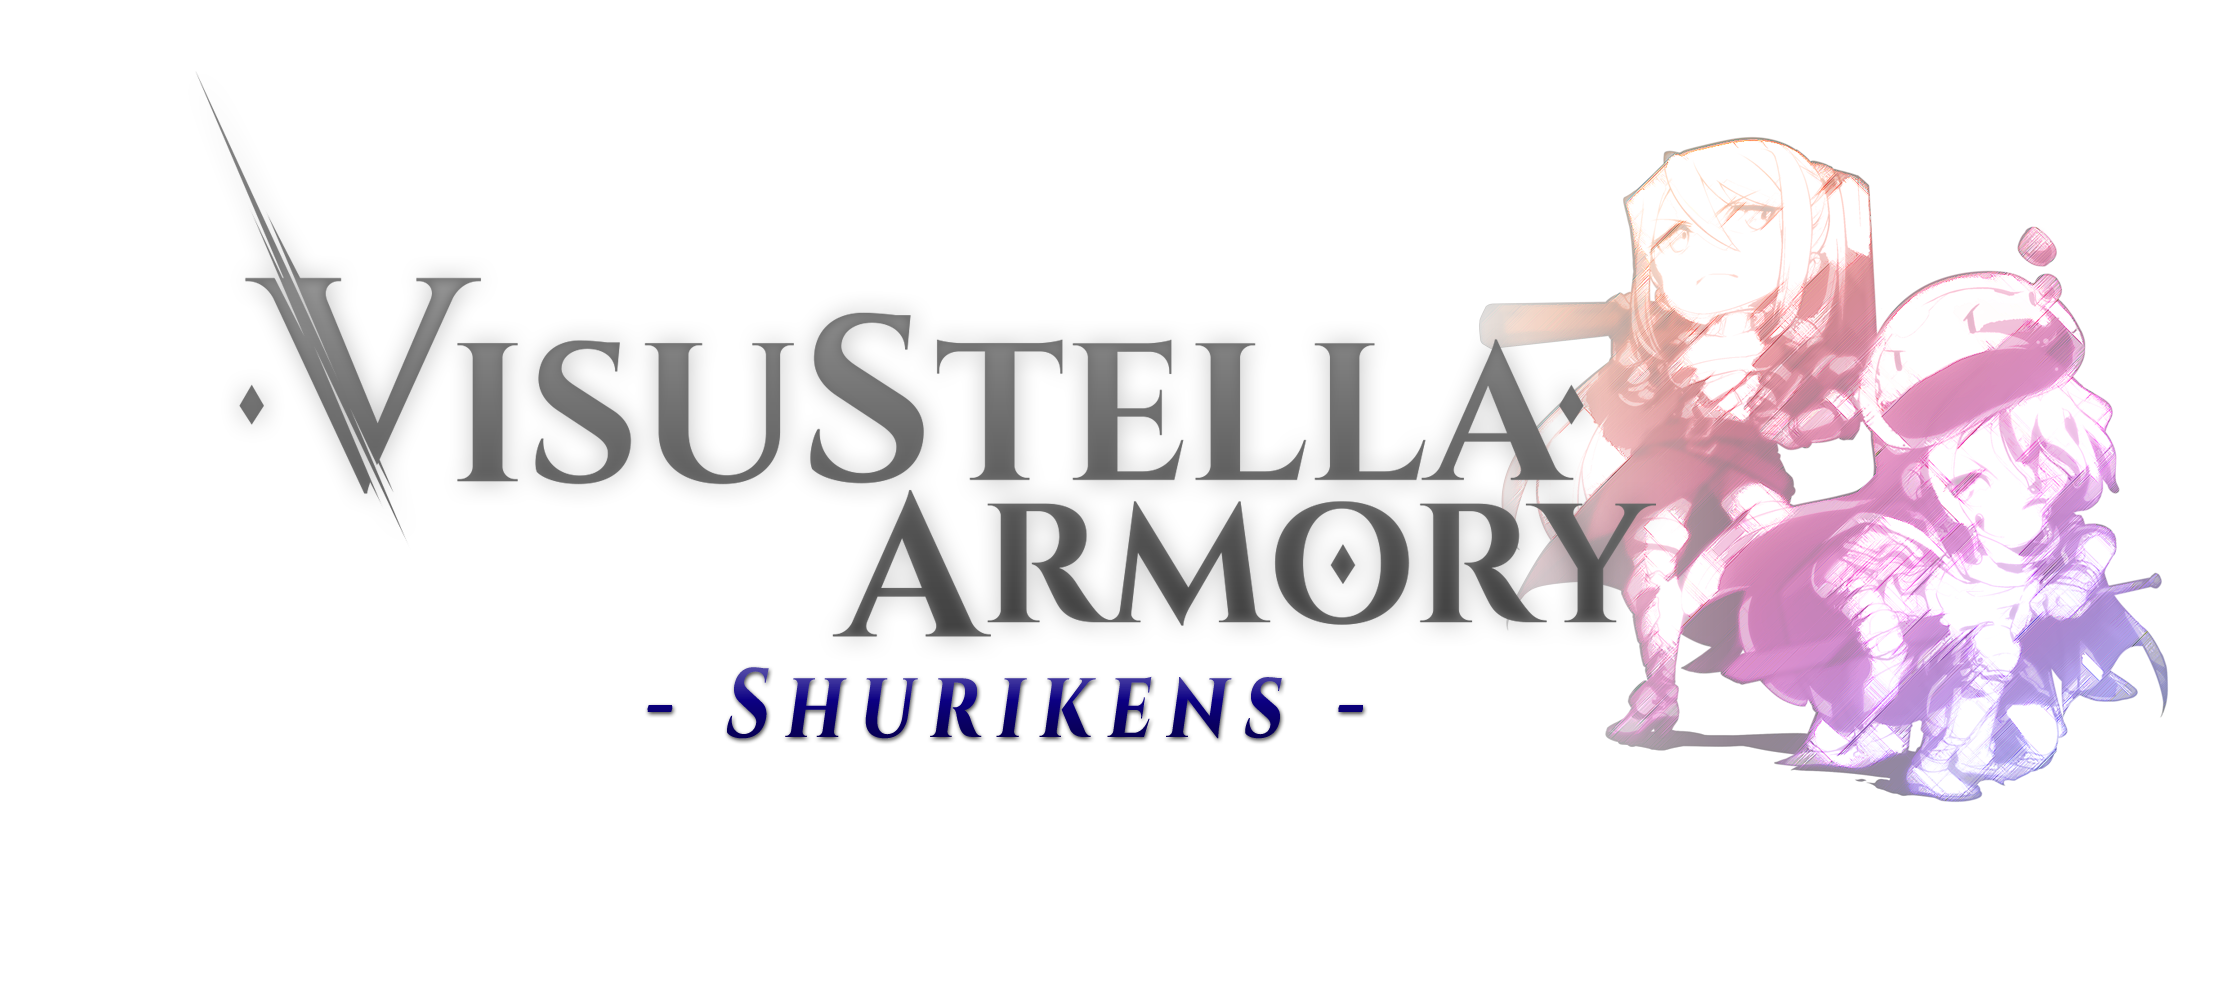 VisuStella Armory: Shurikens